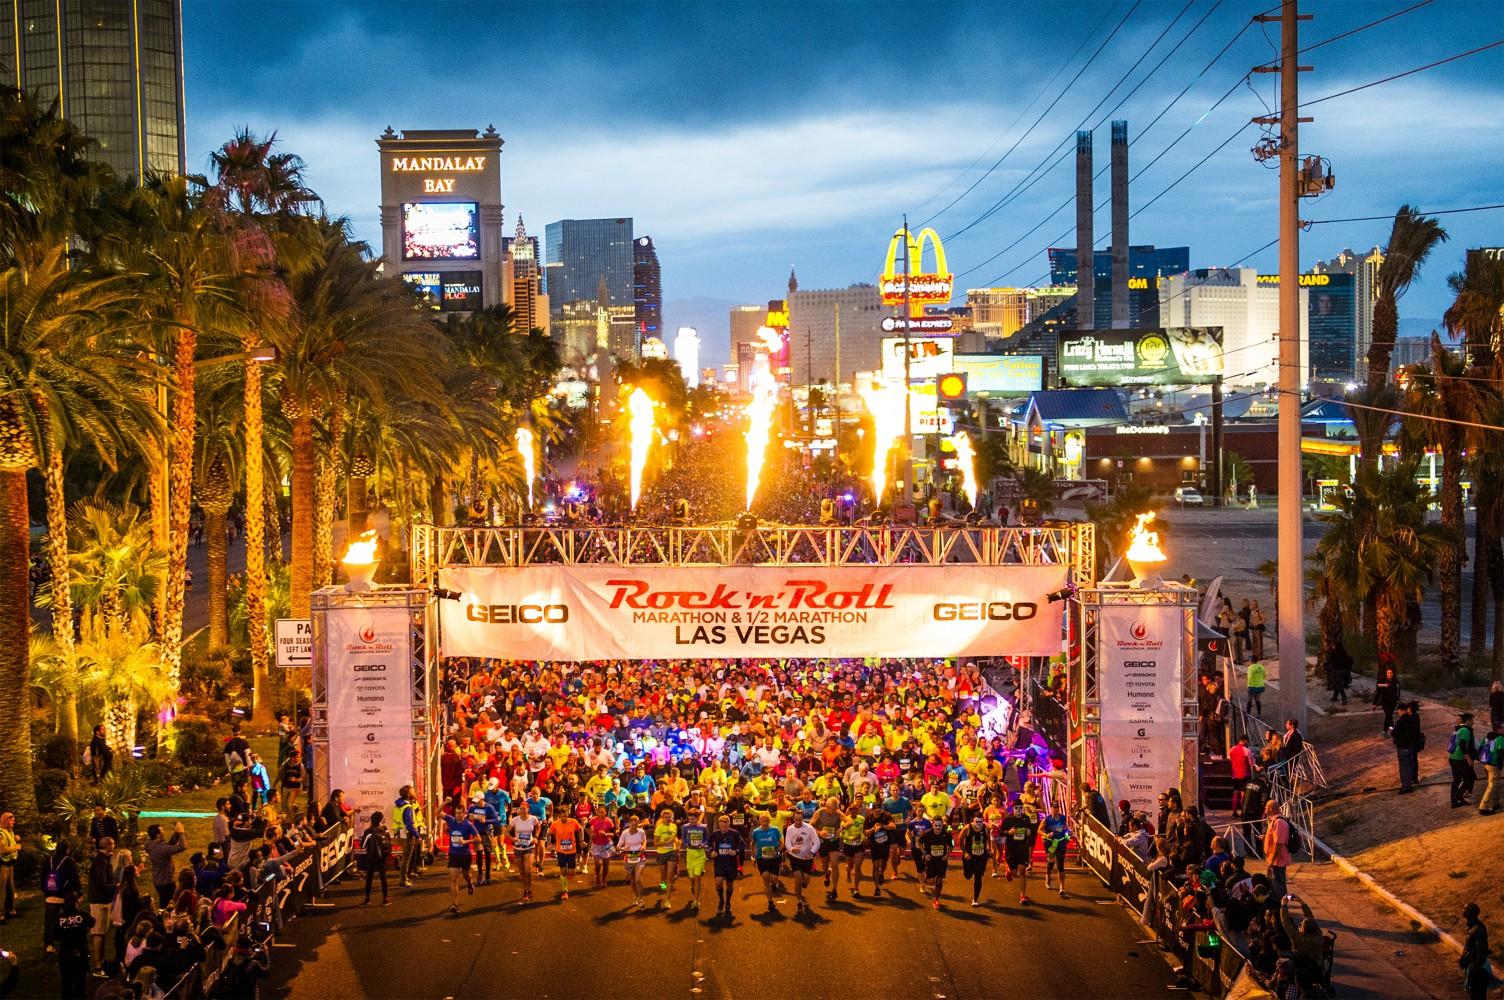 Las Vegas Rock 'N' Roll Marathon